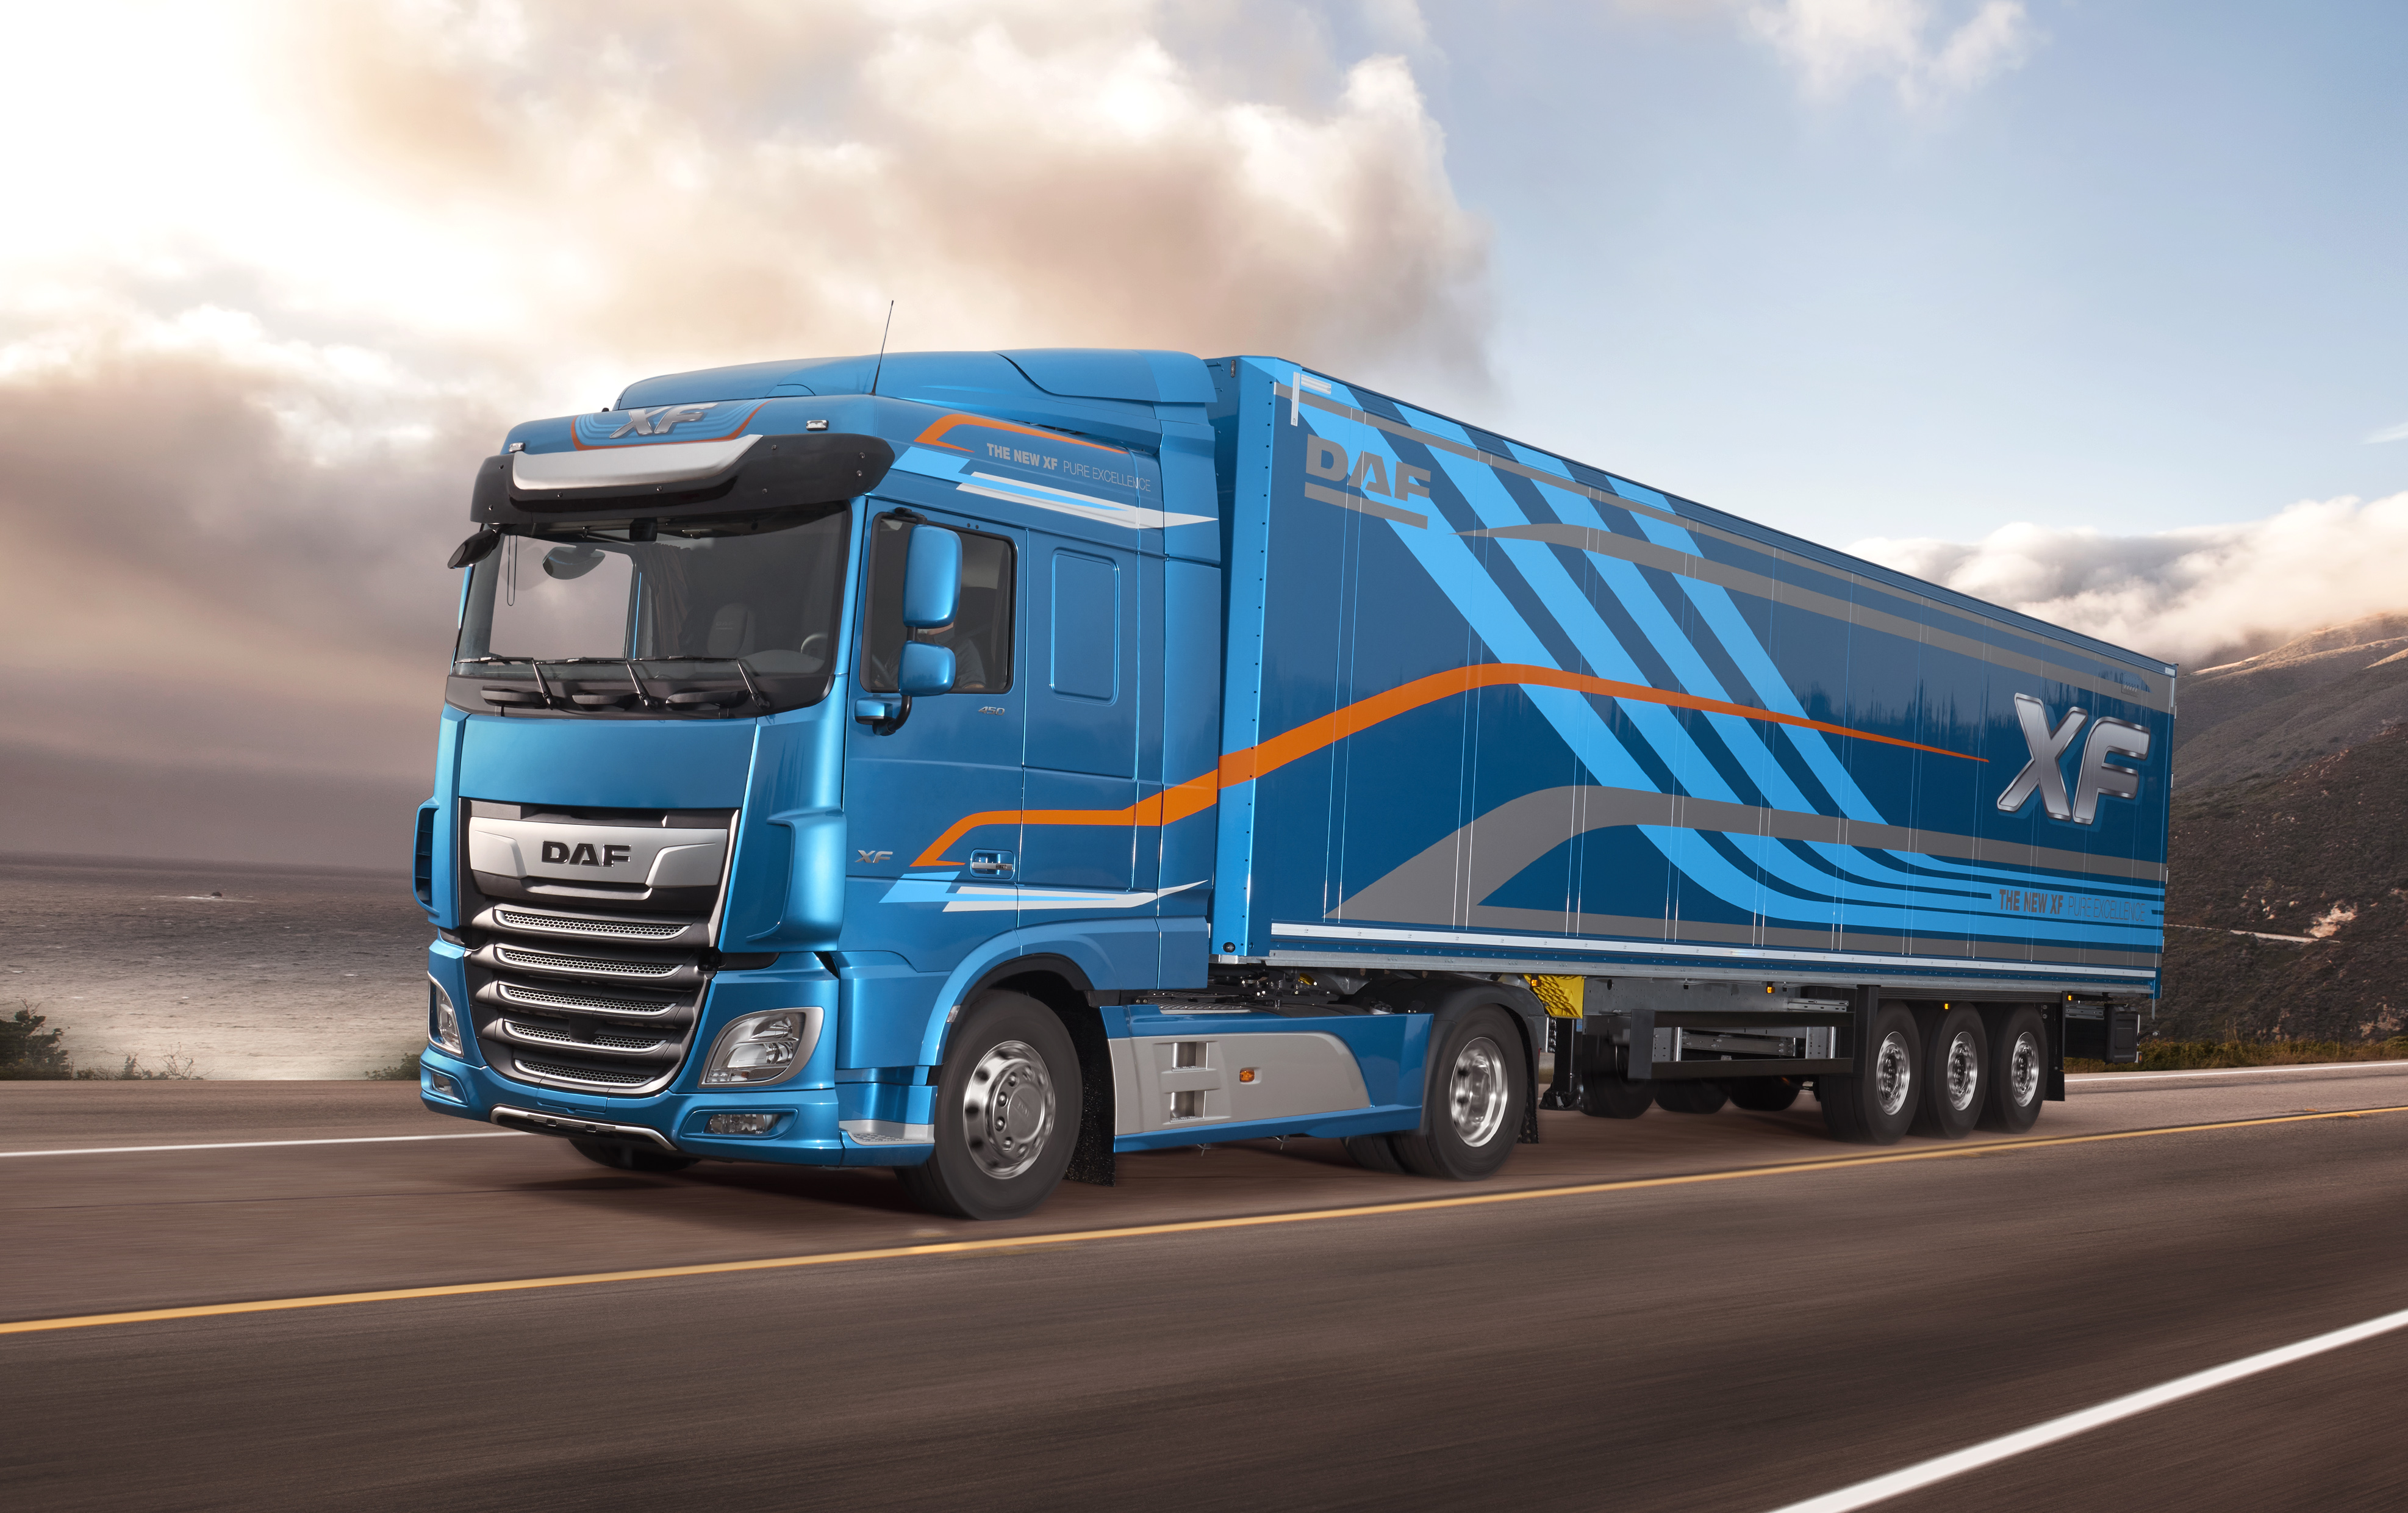 DAF XF 430 FT Long Haul Truck